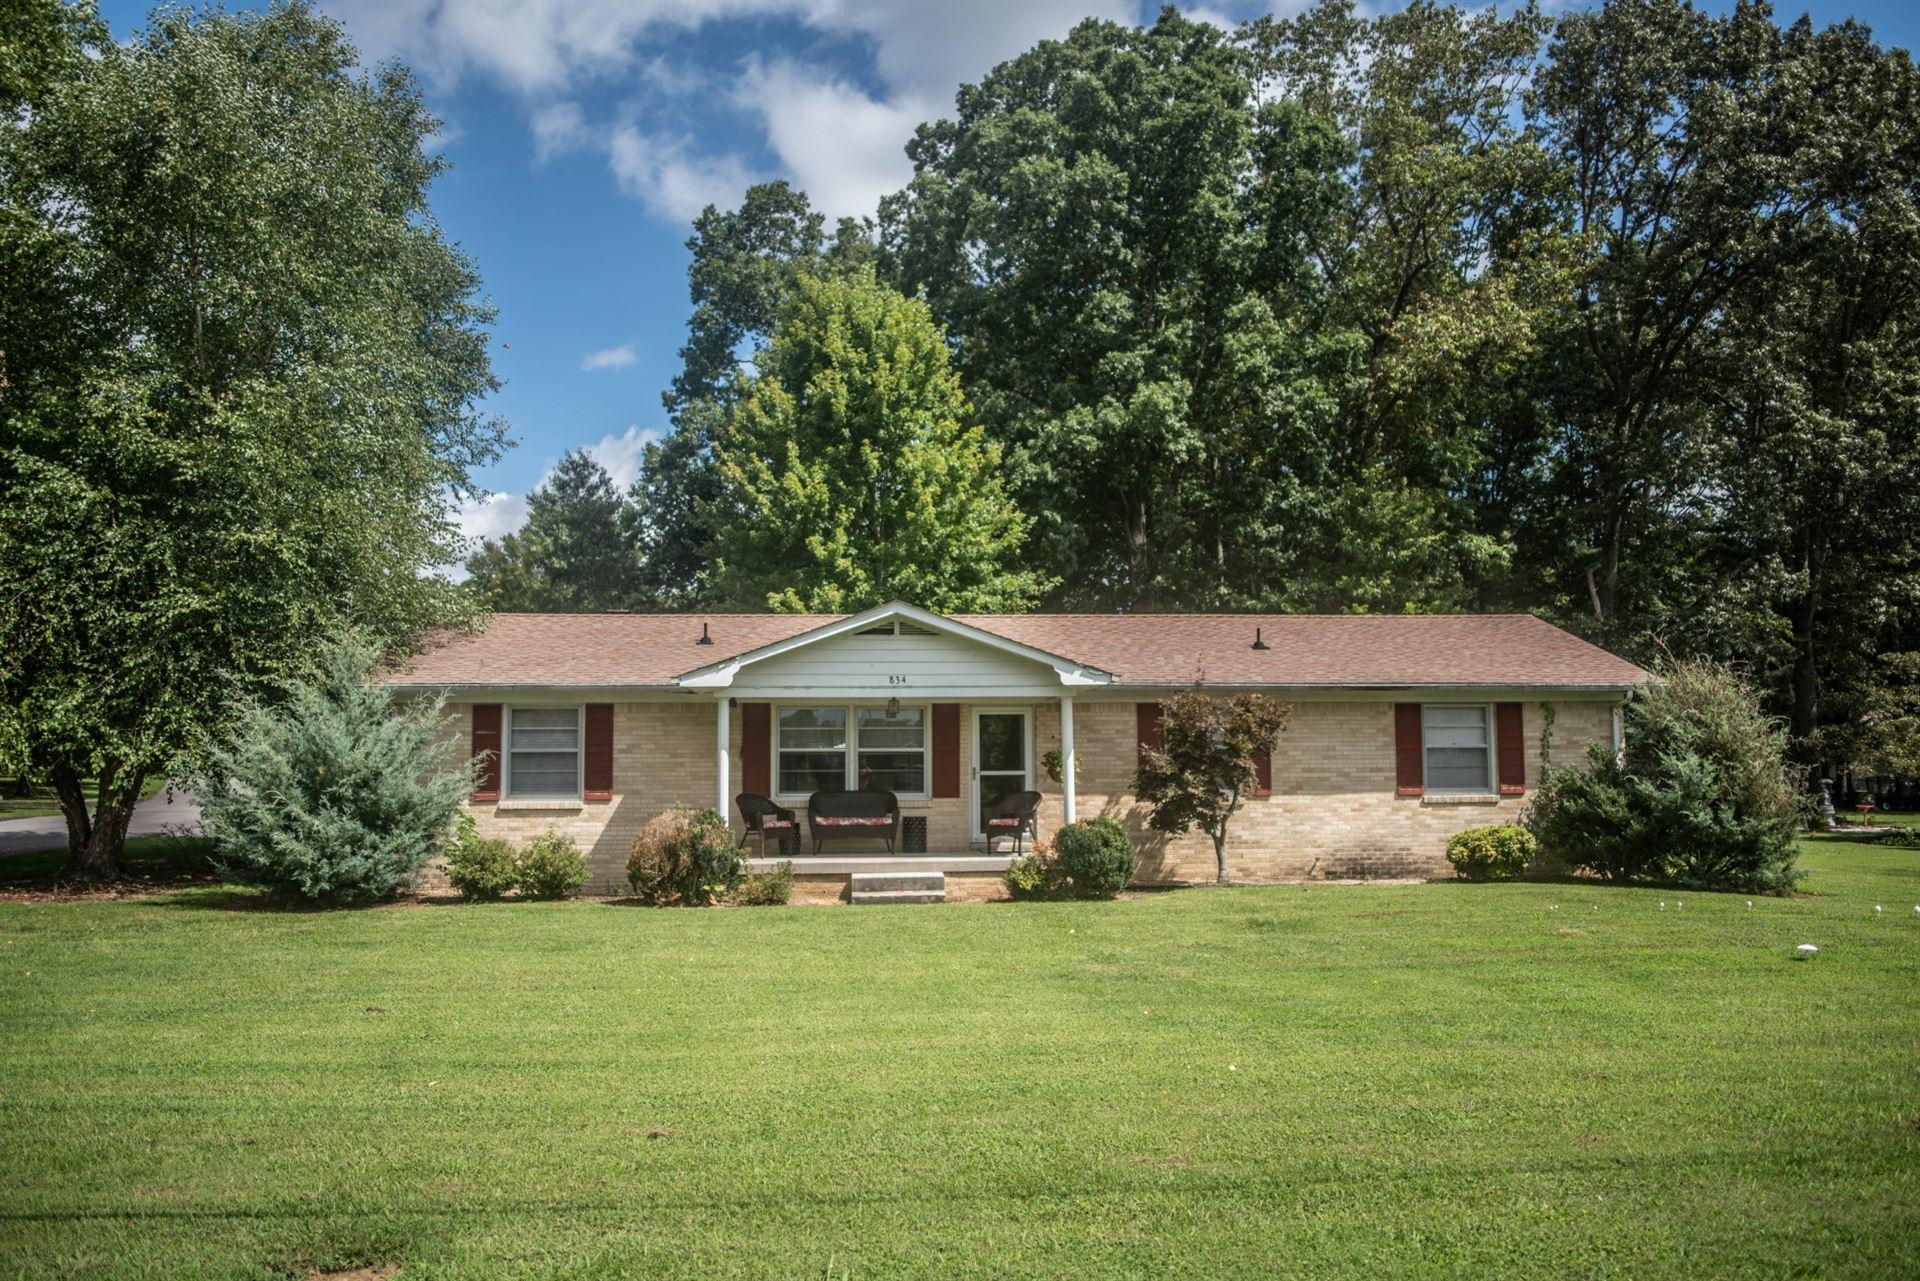 834 Dry Creek Rd, Smithville, TN 37166 - MLS#: 2182555